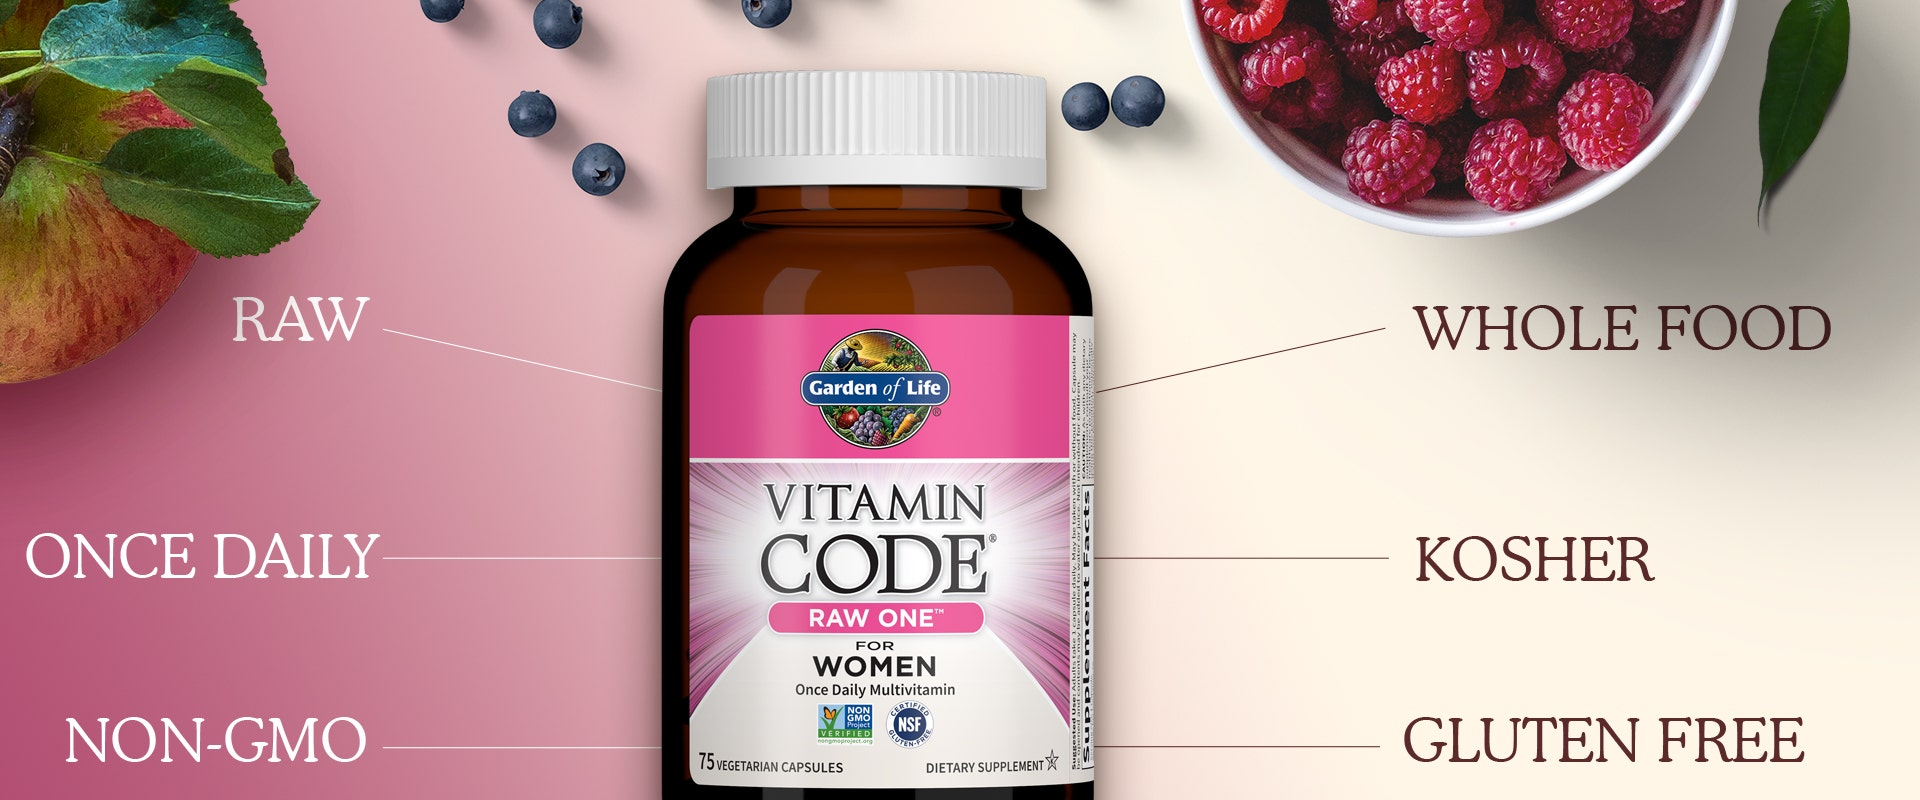 Raw One Women by Garden of Life Vitamin Code